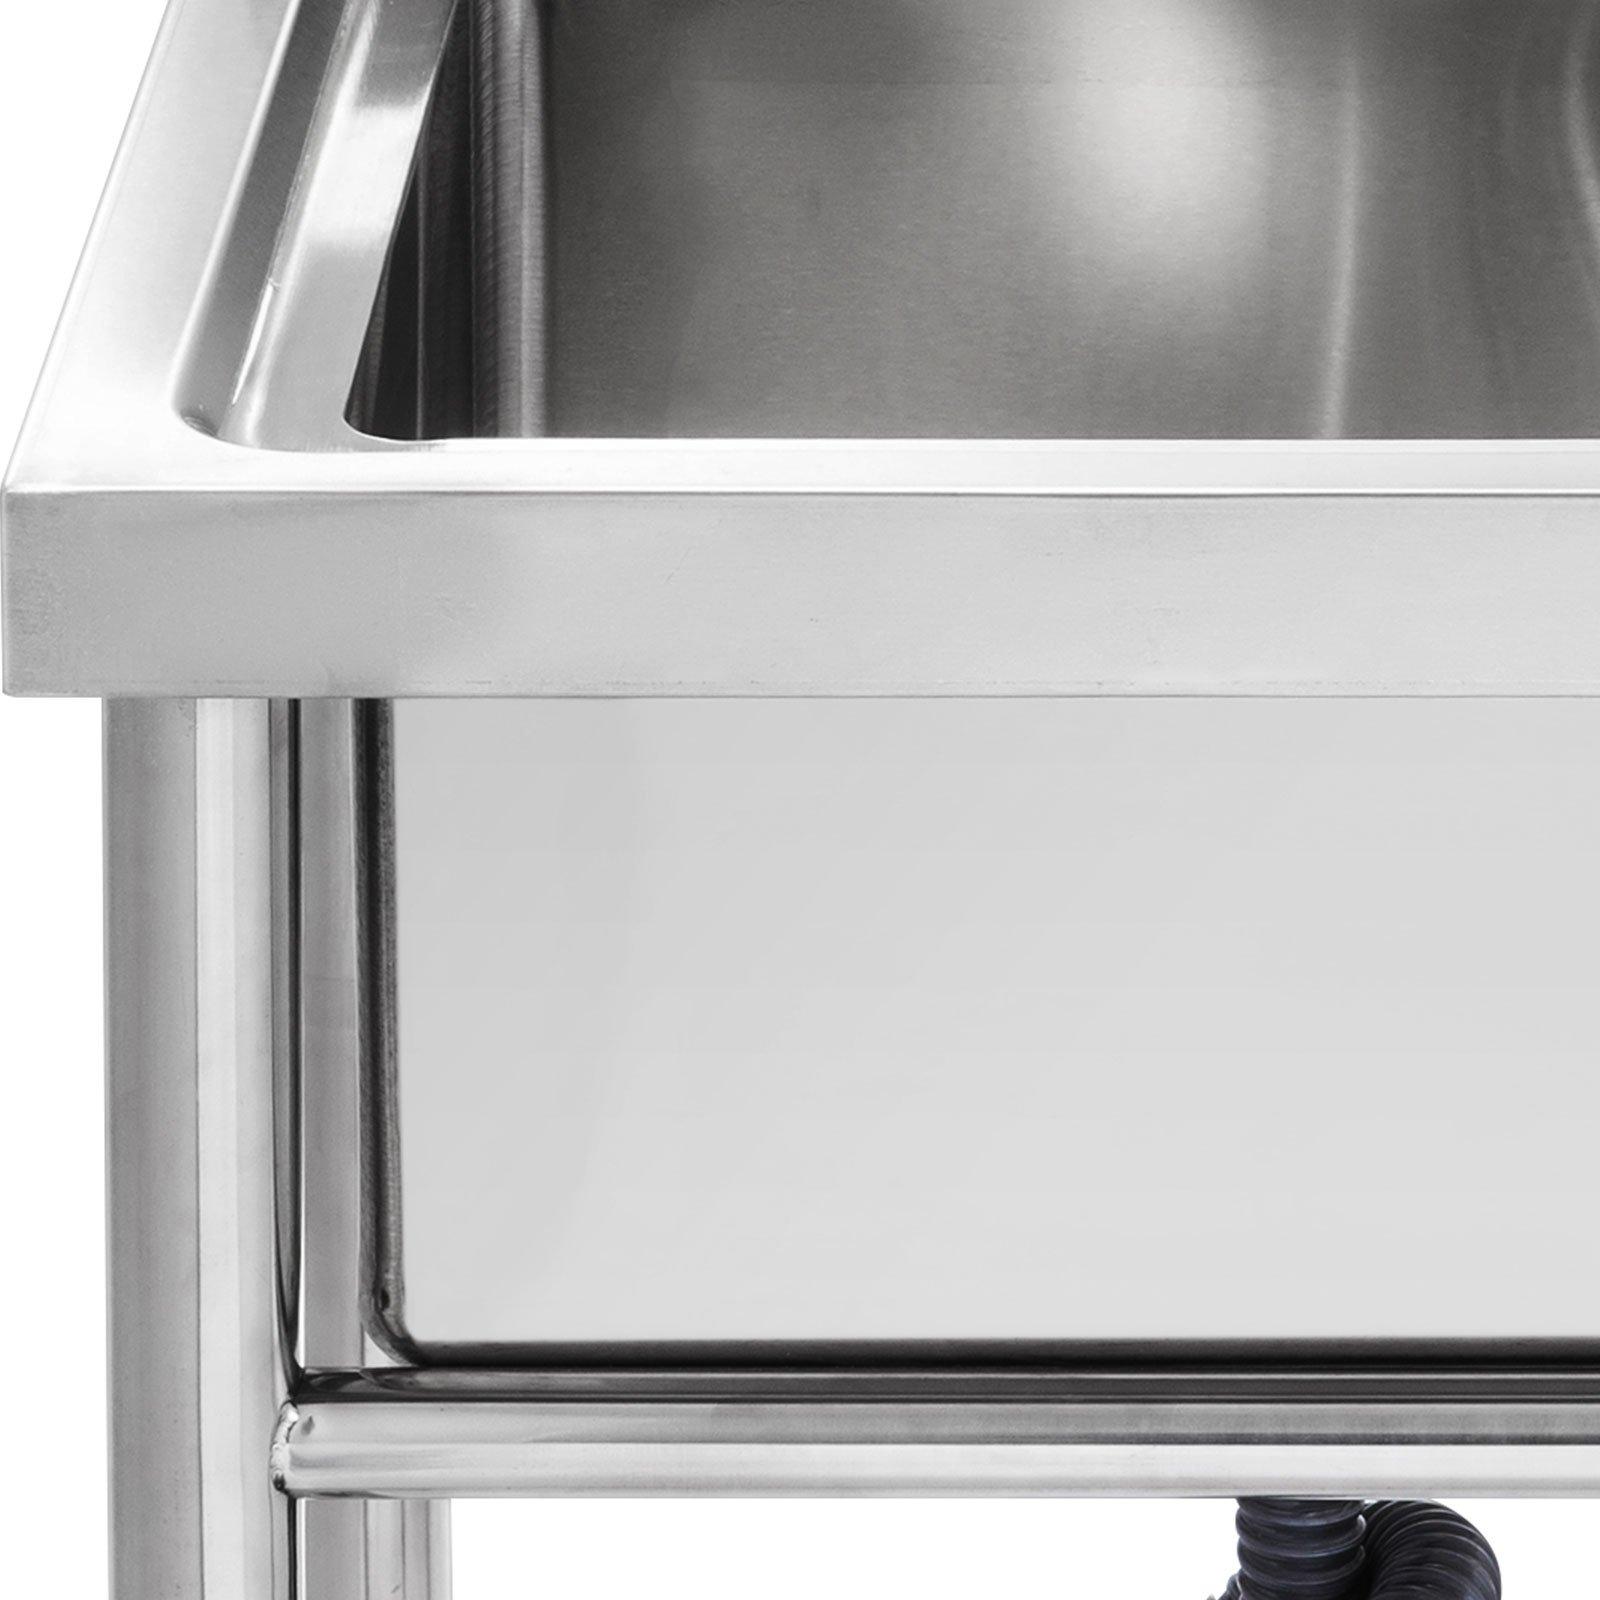 "Mophorn 2 Compartment Stainless Steel Bar Sink 15.5"" x 16.5""Bowl Size Handmade Underbar Sink for bar, kitchen restaurant by Mophorn (Image #5)"